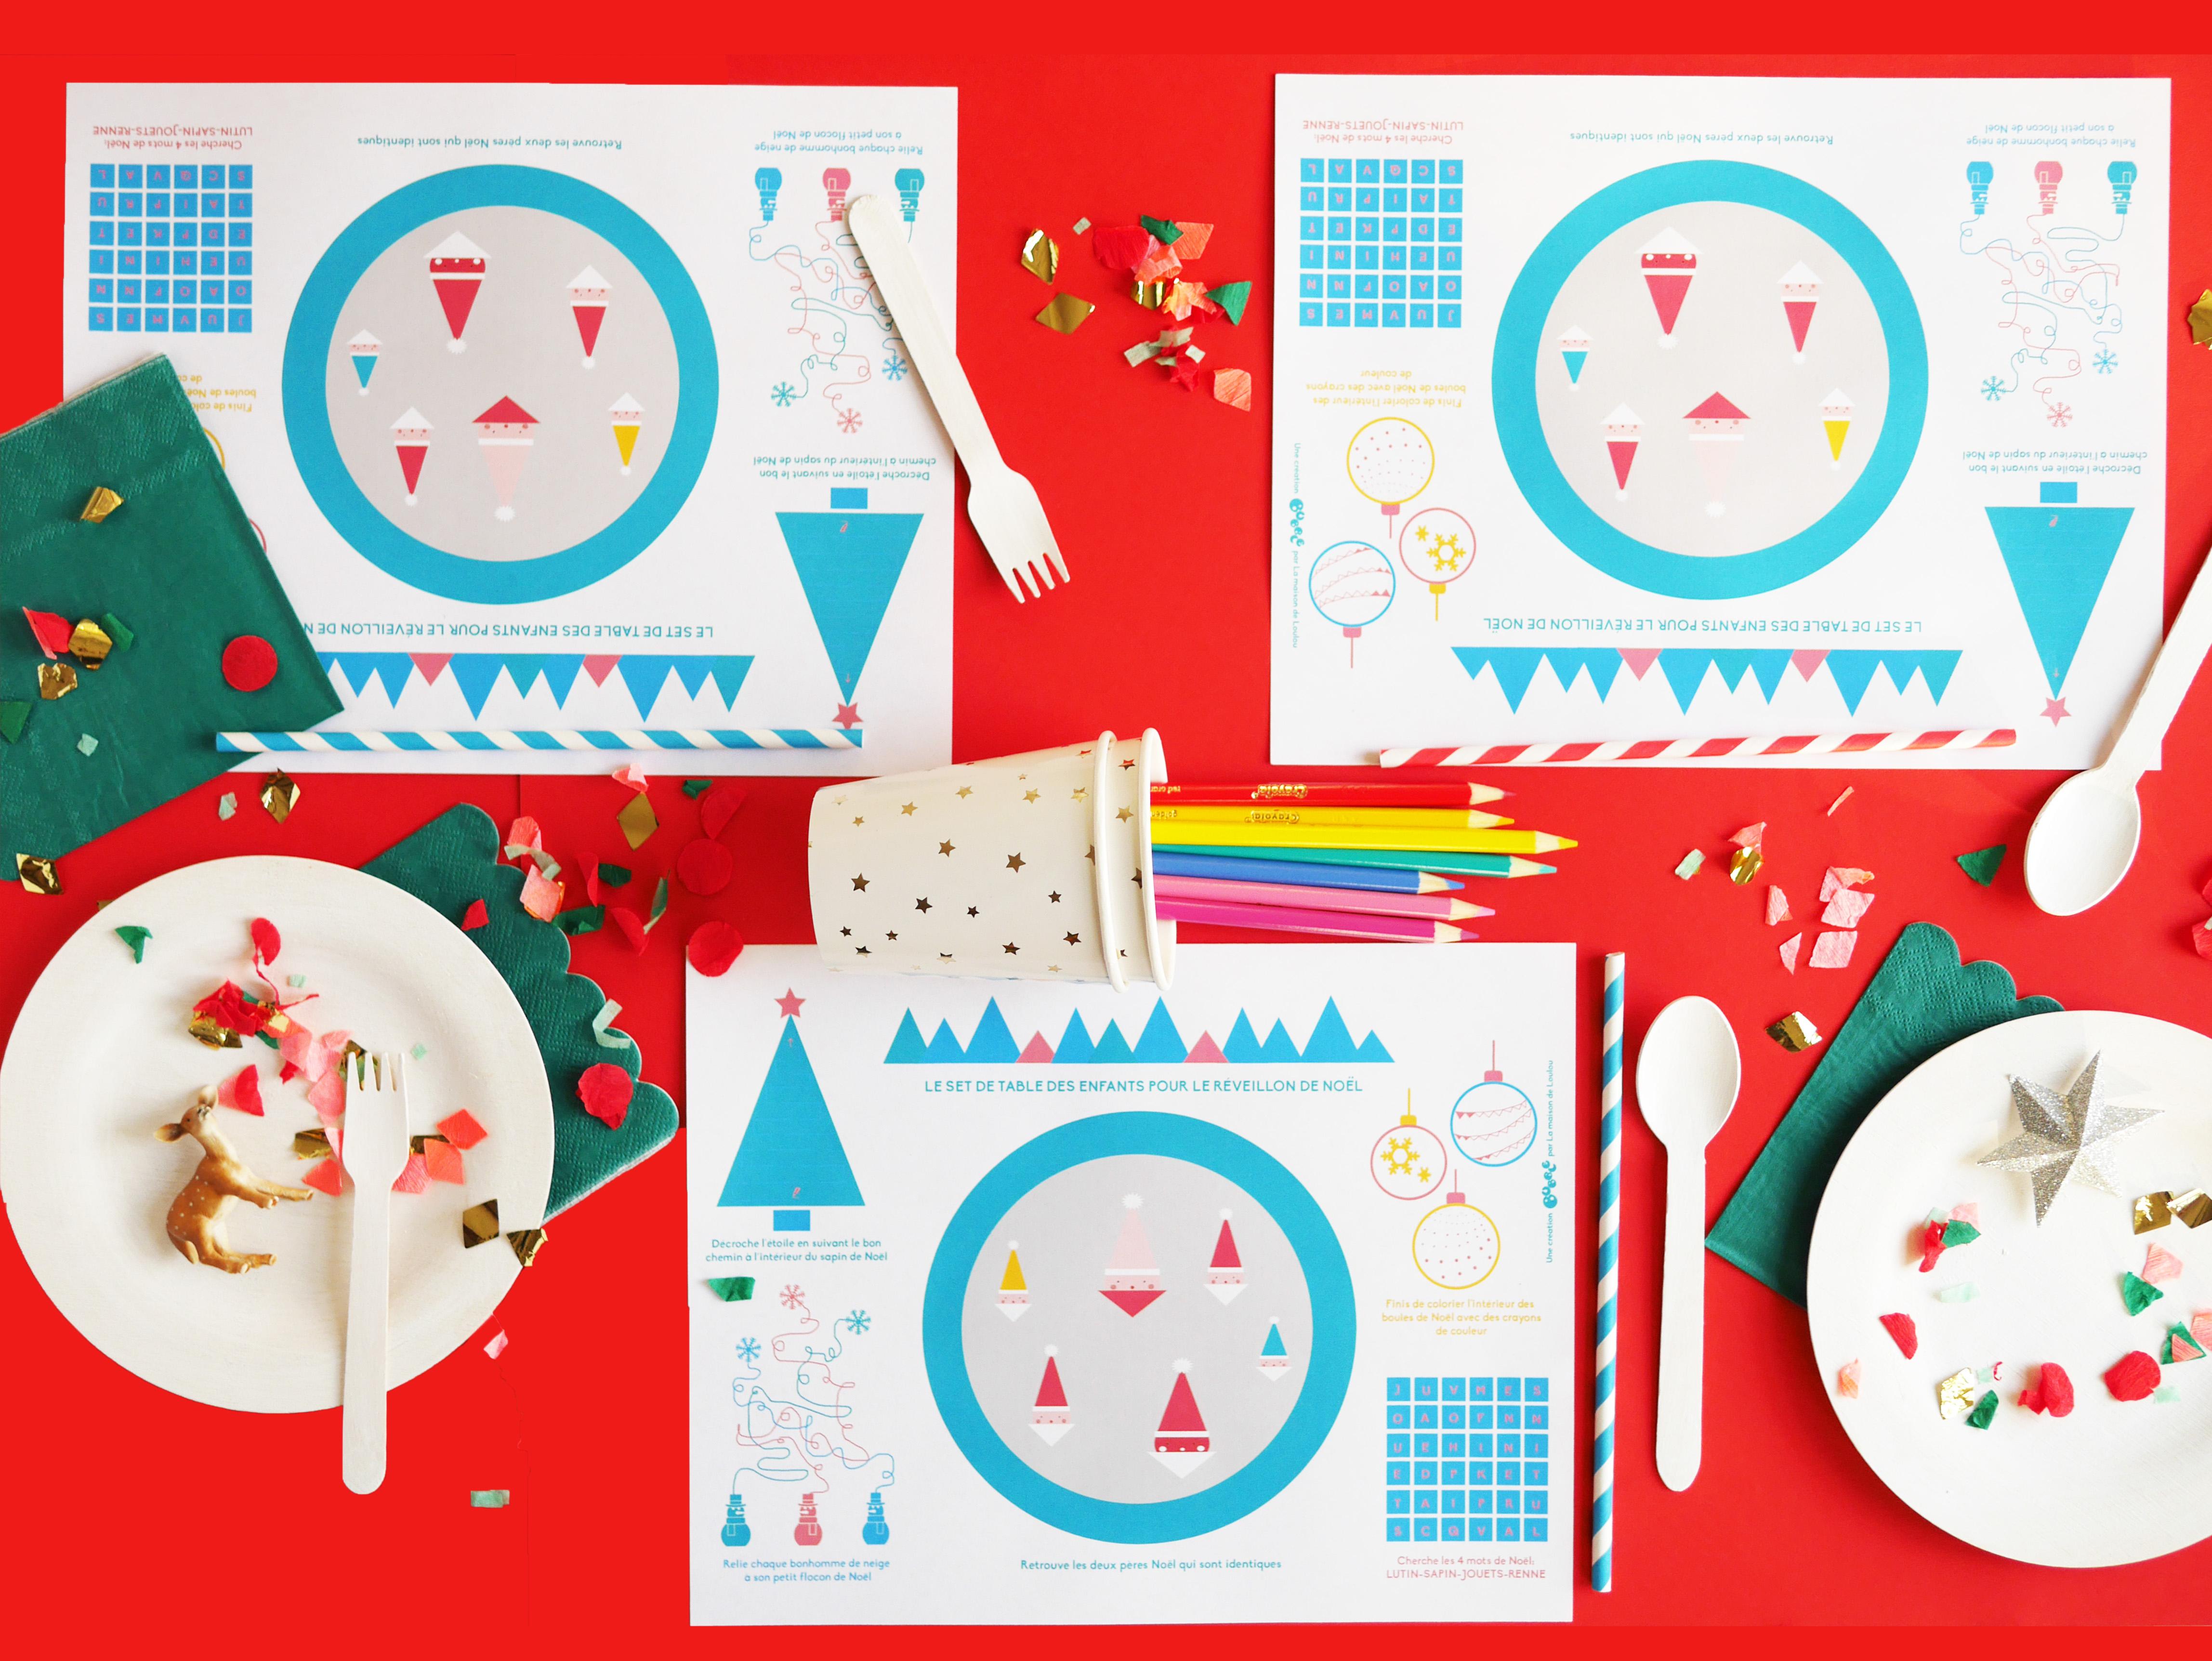 Interactive Free Printable Christmas Placematla Maison De Loulou | - Free Printable Christmas Placemats For Adults